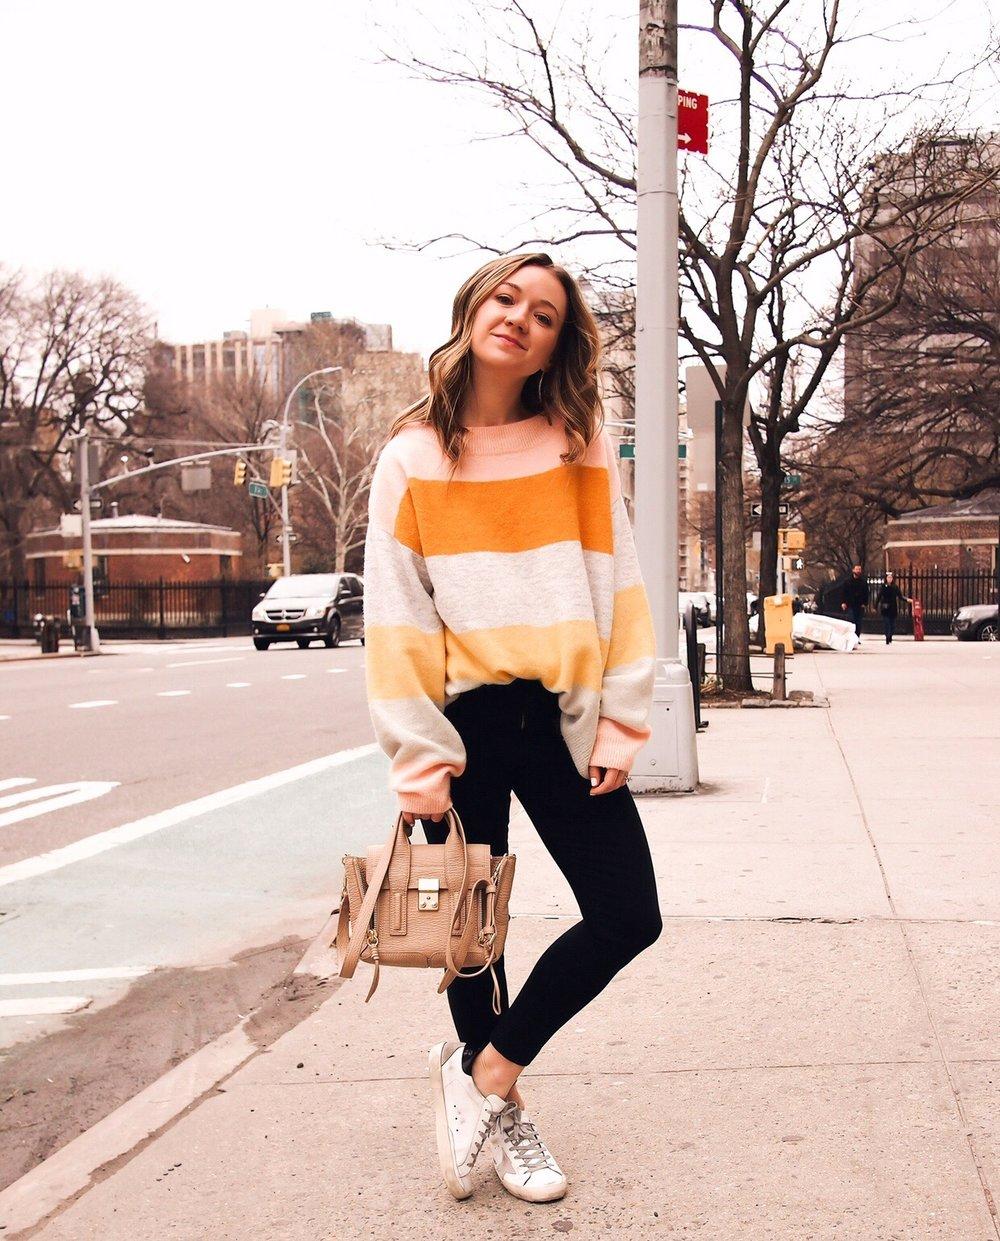 Fizz-fade-striped-sweater.JPG